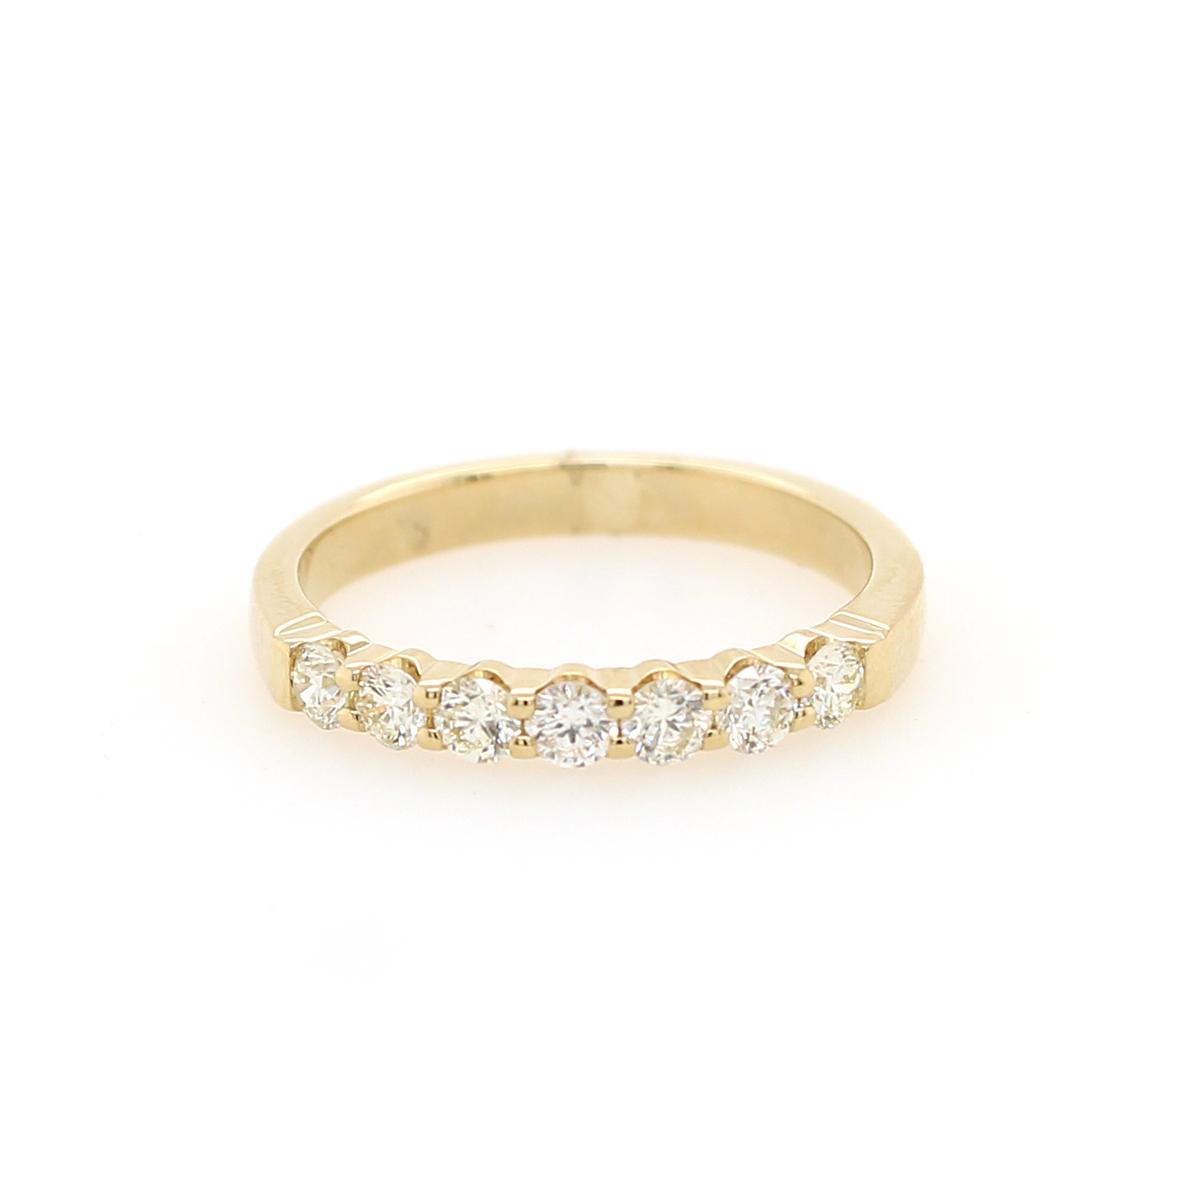 Shefi Diamonds 14 Karat Yellow Gold .5 Carat Wedding Band